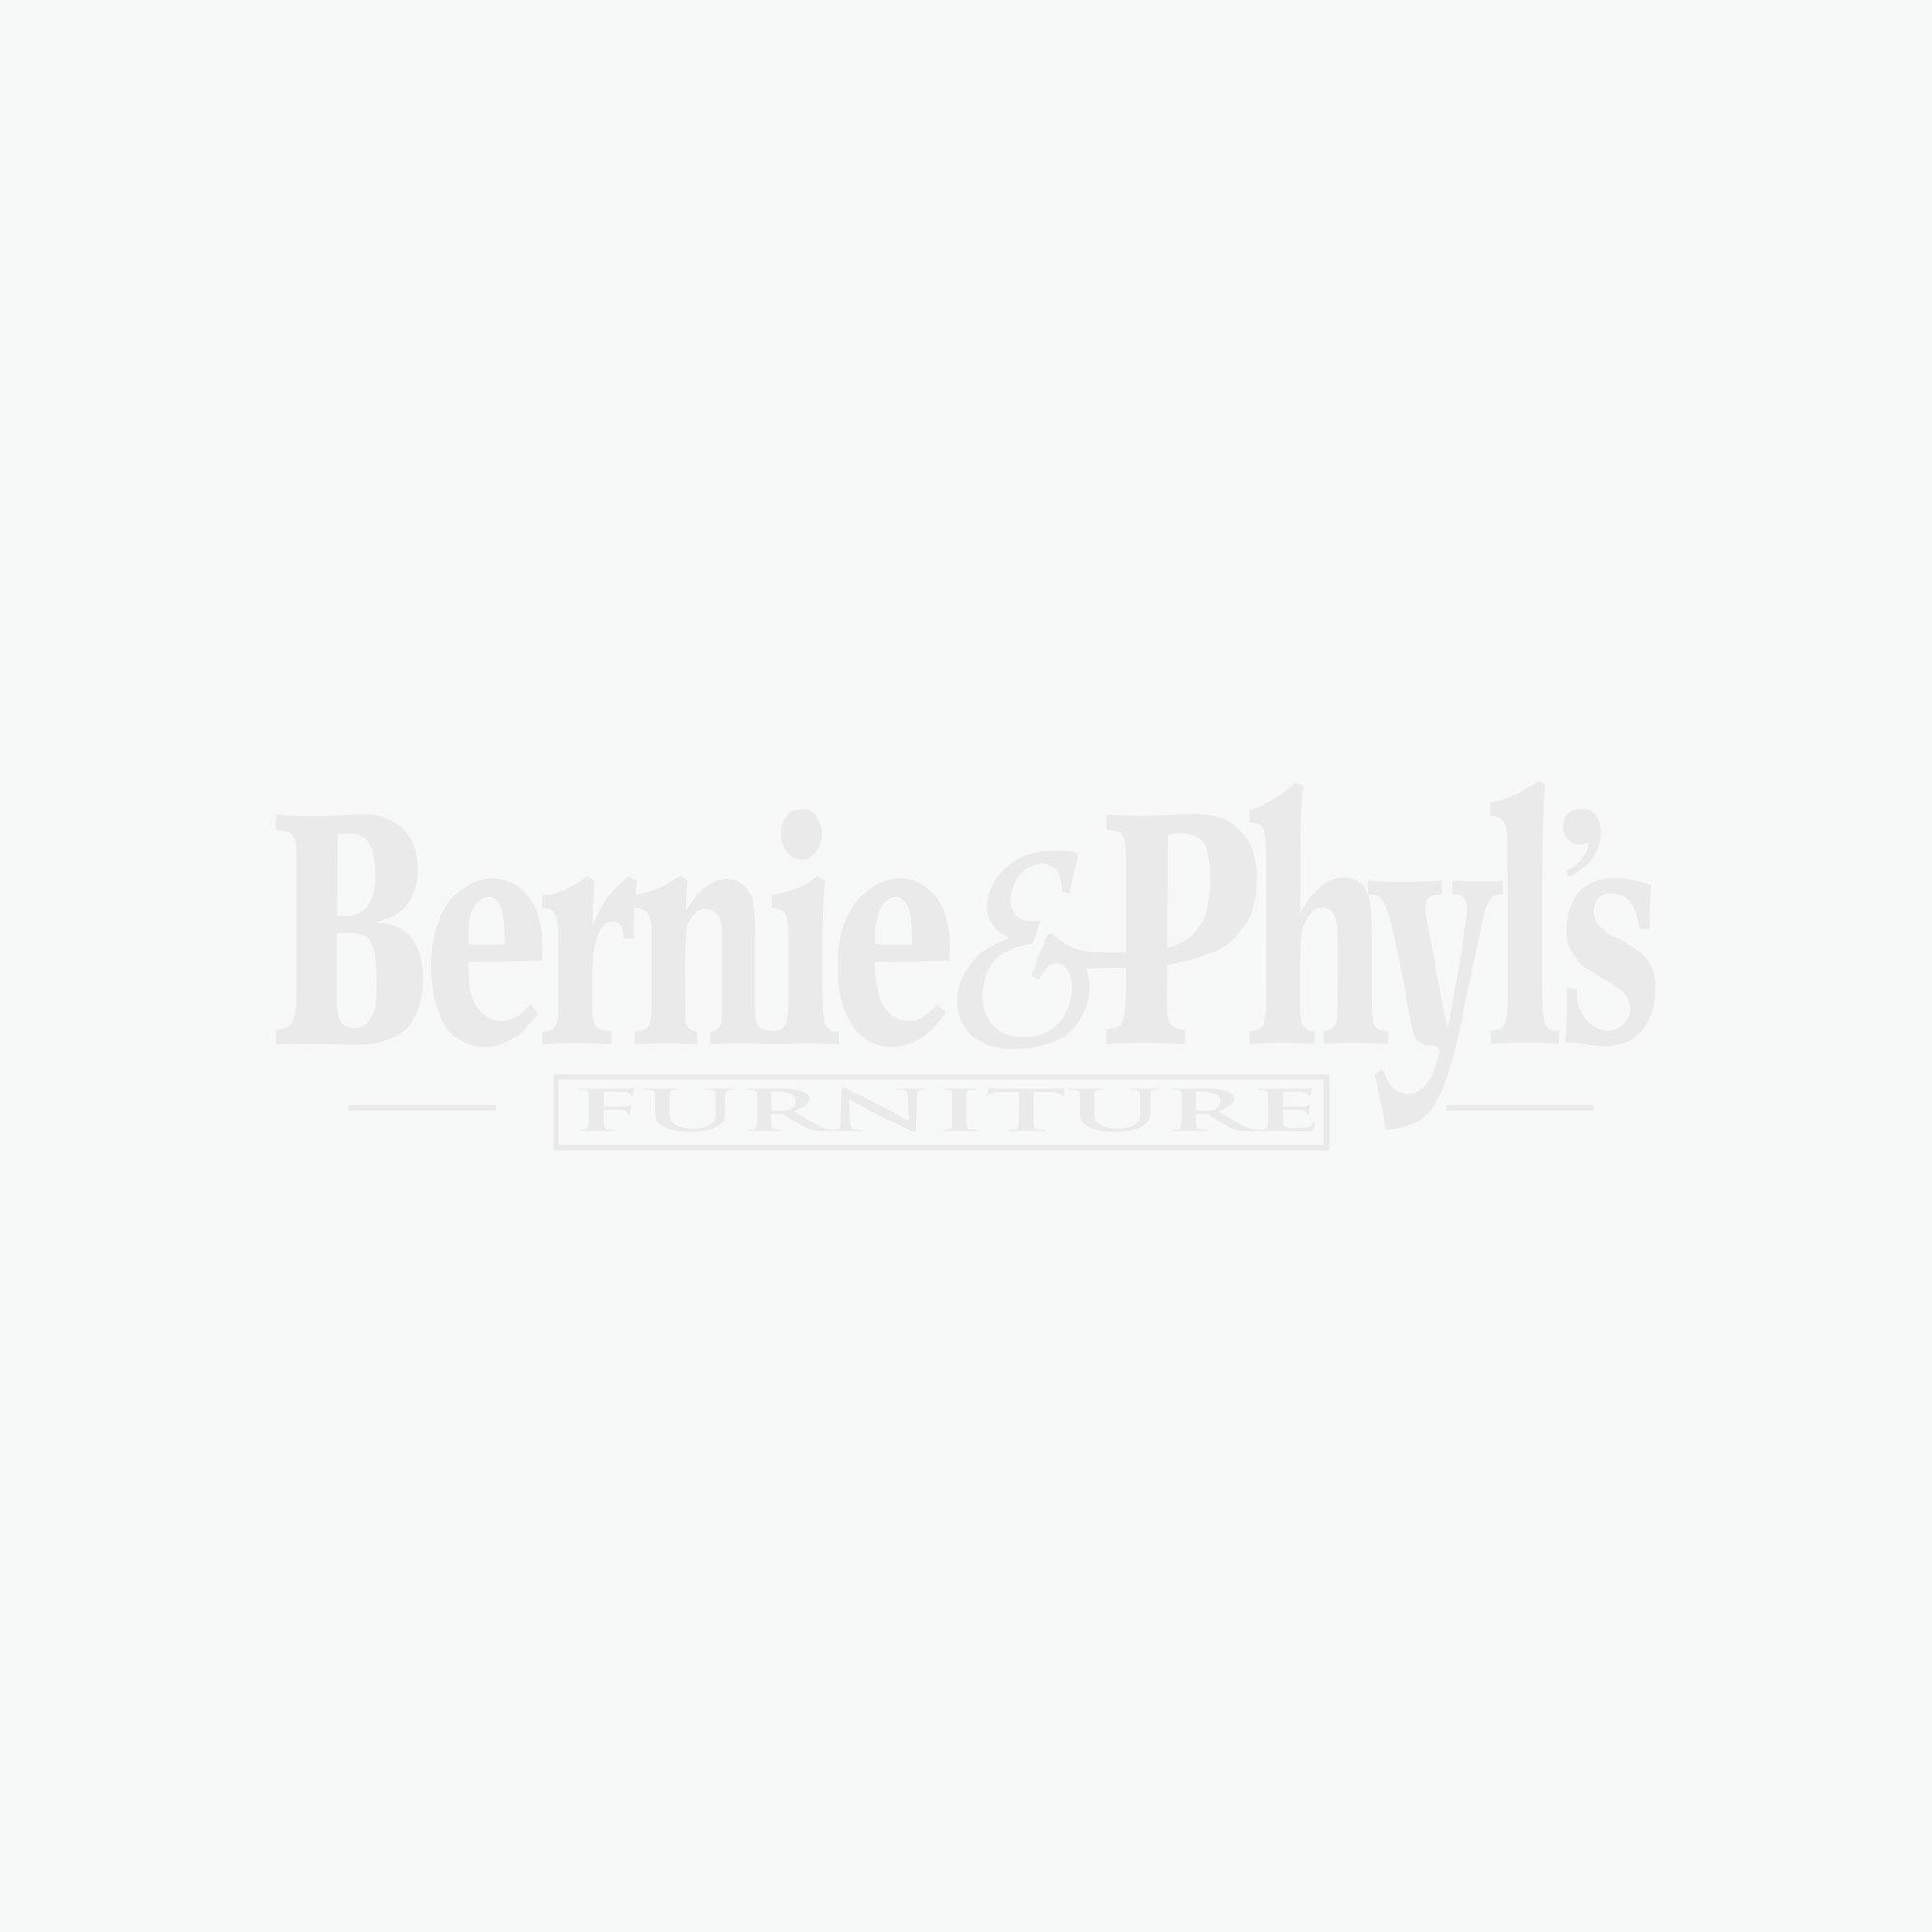 Mattress Mattresses Bed Frames Bernie & Phyl s Furniture